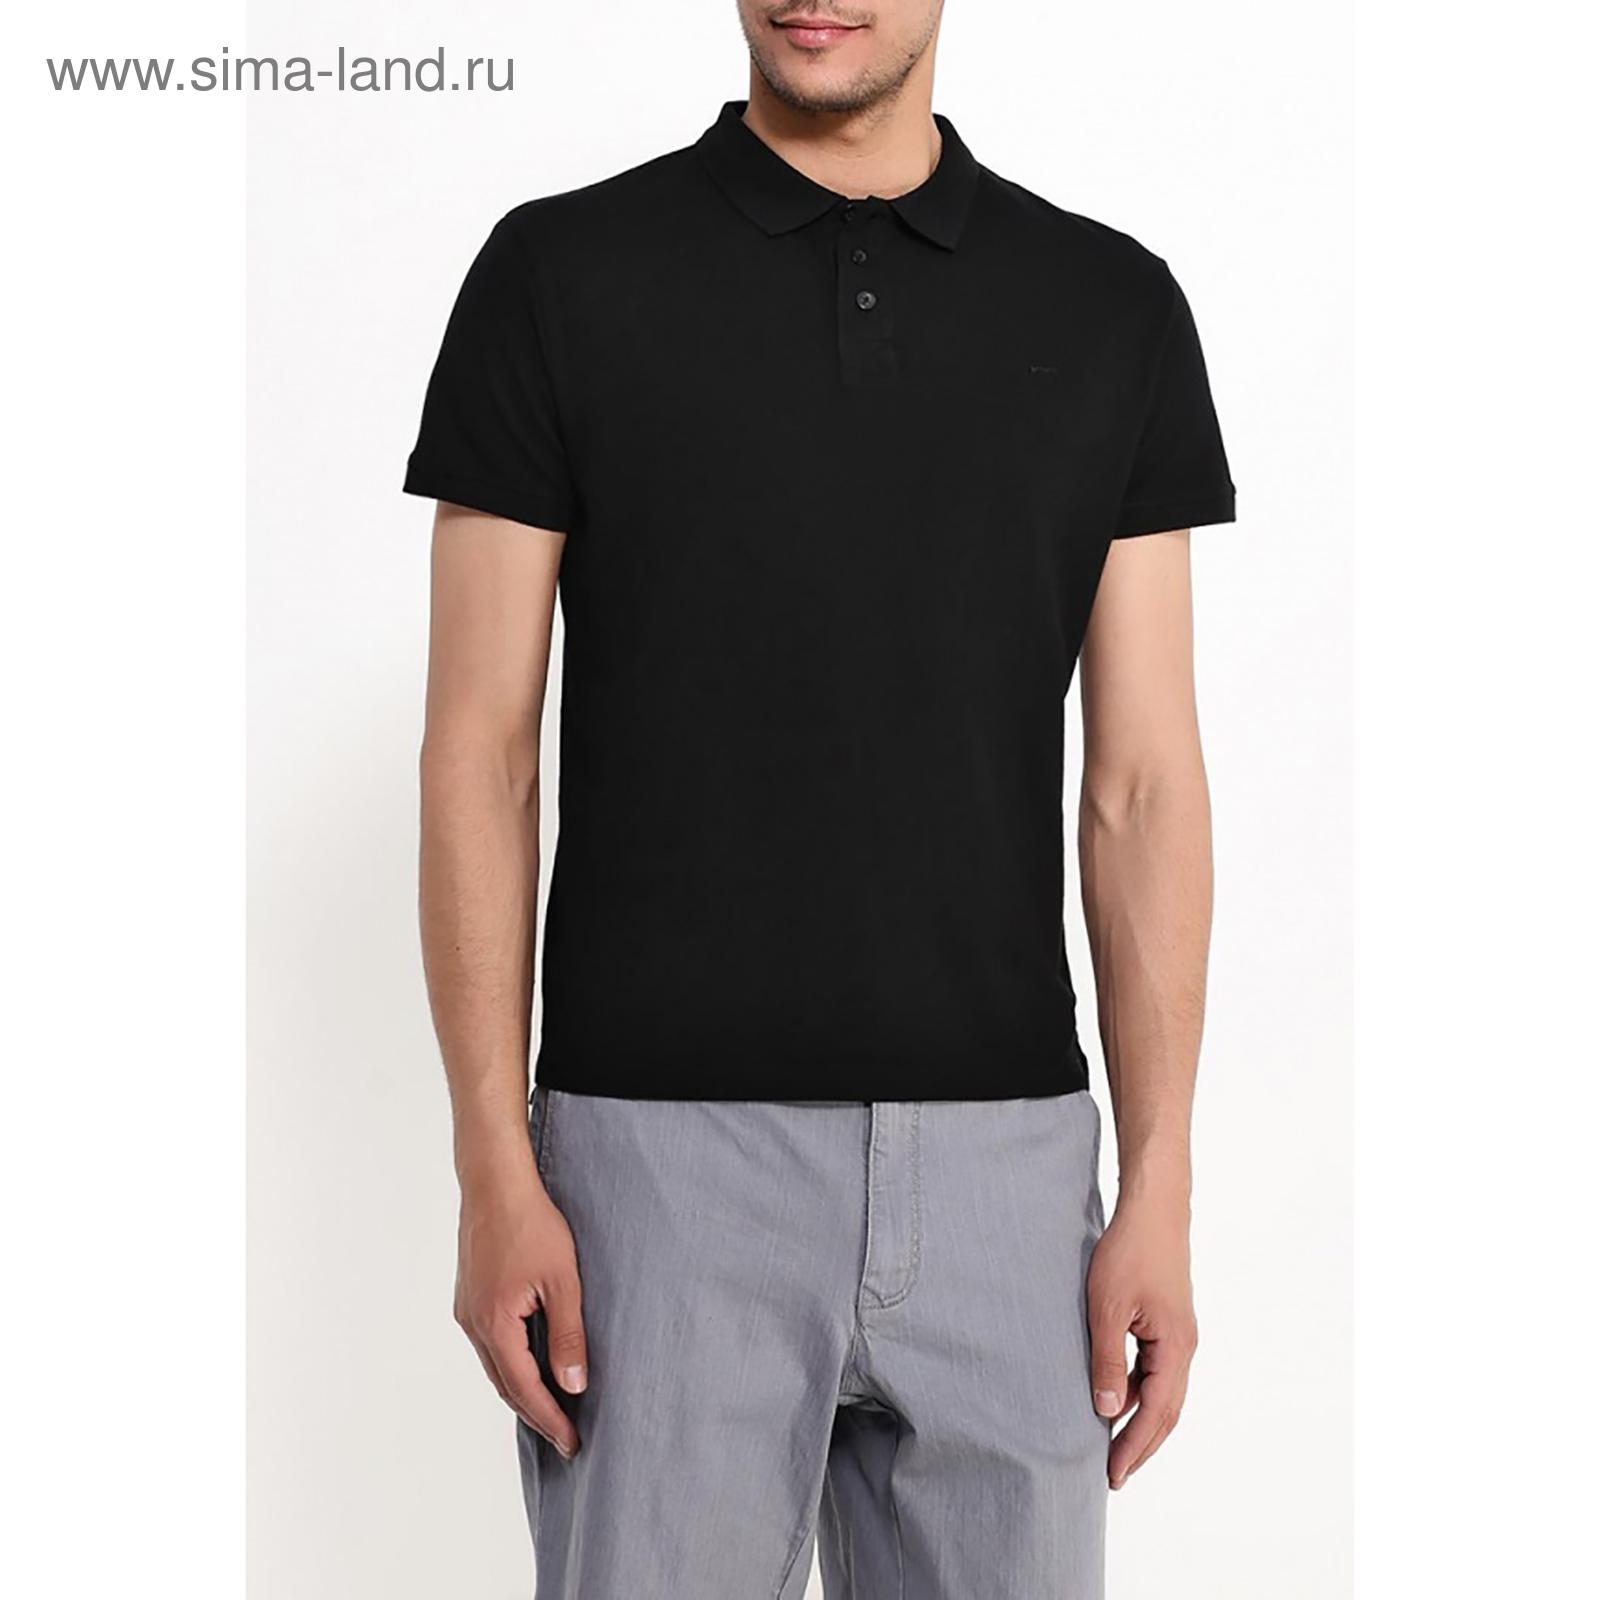 c39a0ed68be79 Футболка-поло мужская, цвет чёрный, размер 48 (M), рост 176 см (арт ...